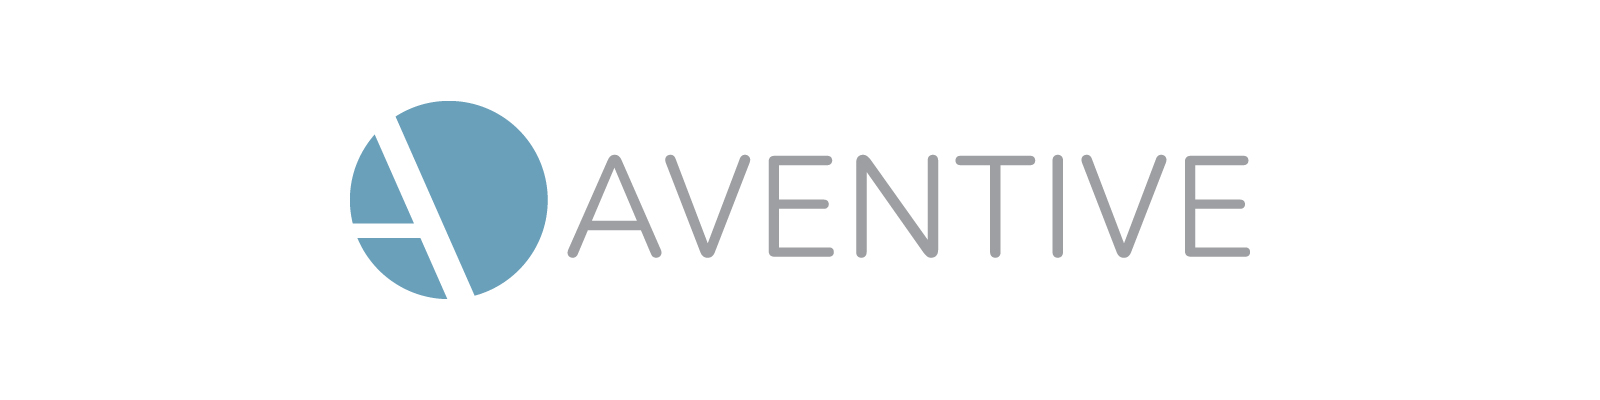 Aventive Logo